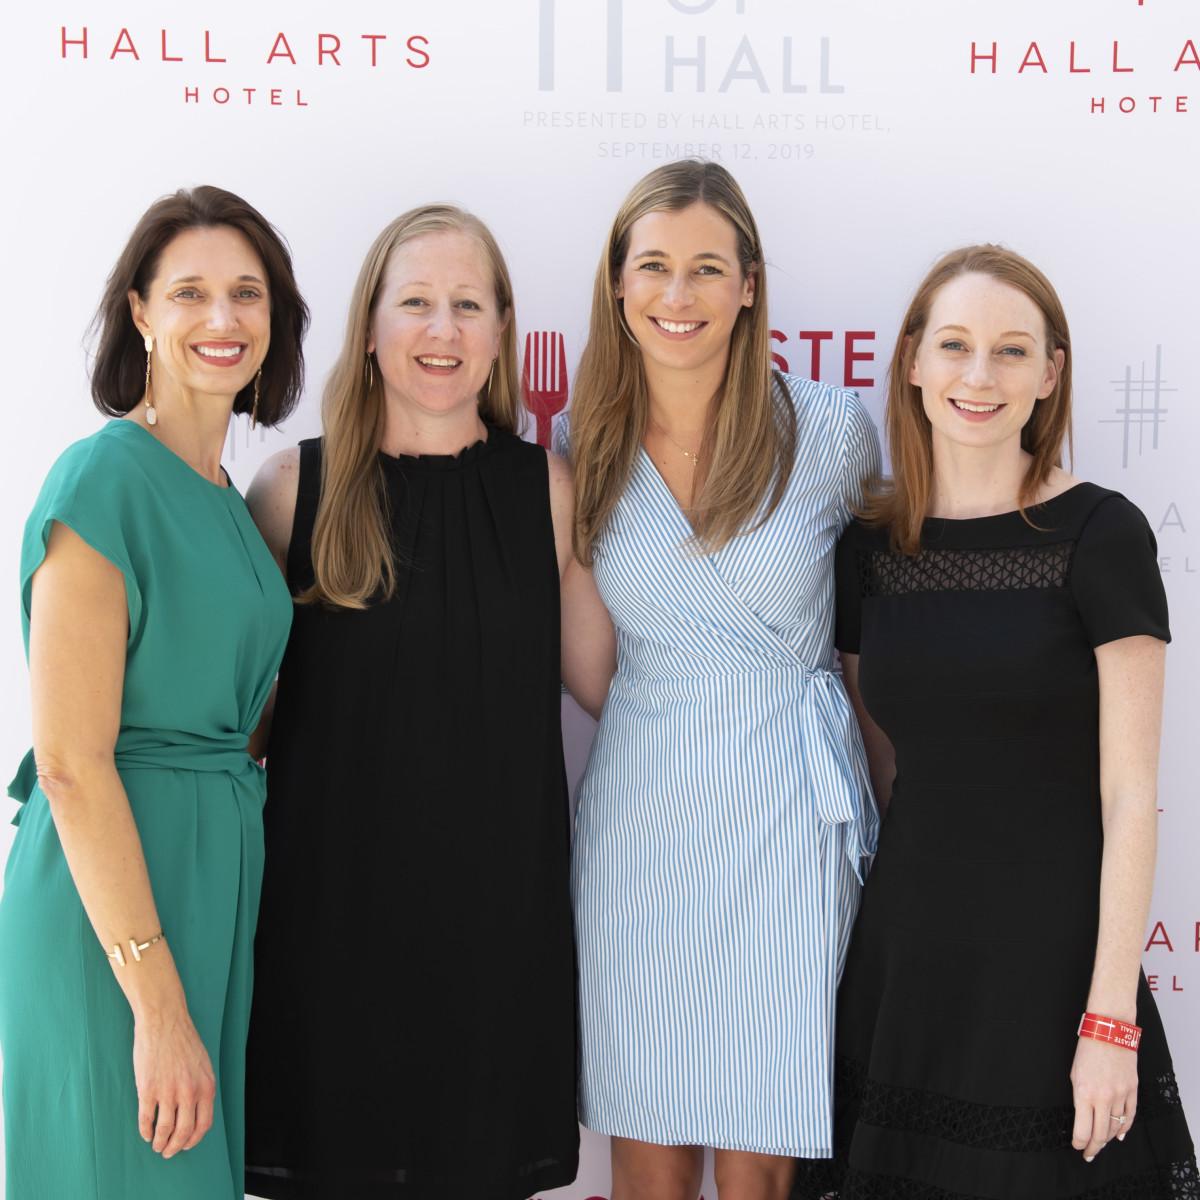 Kymberley Scalia, Sara Lovas, Abby Witkowski and Sarah Hoffman